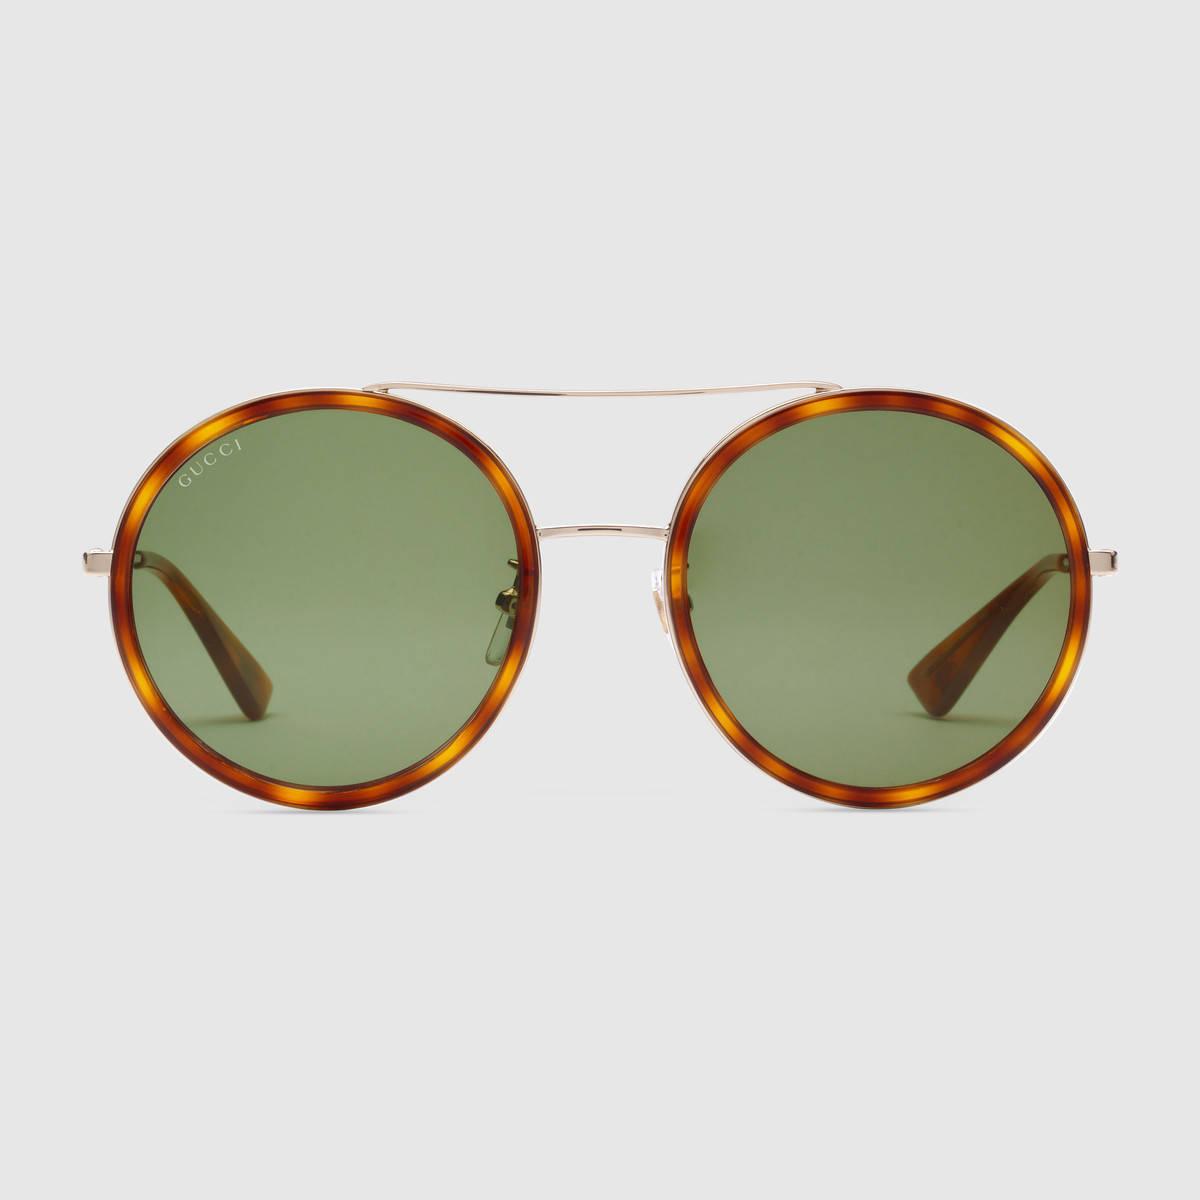 461703_I3330_7273_001_100_0000_Light-Sonnenbrille-mit-rundem-Rahmen.jpg